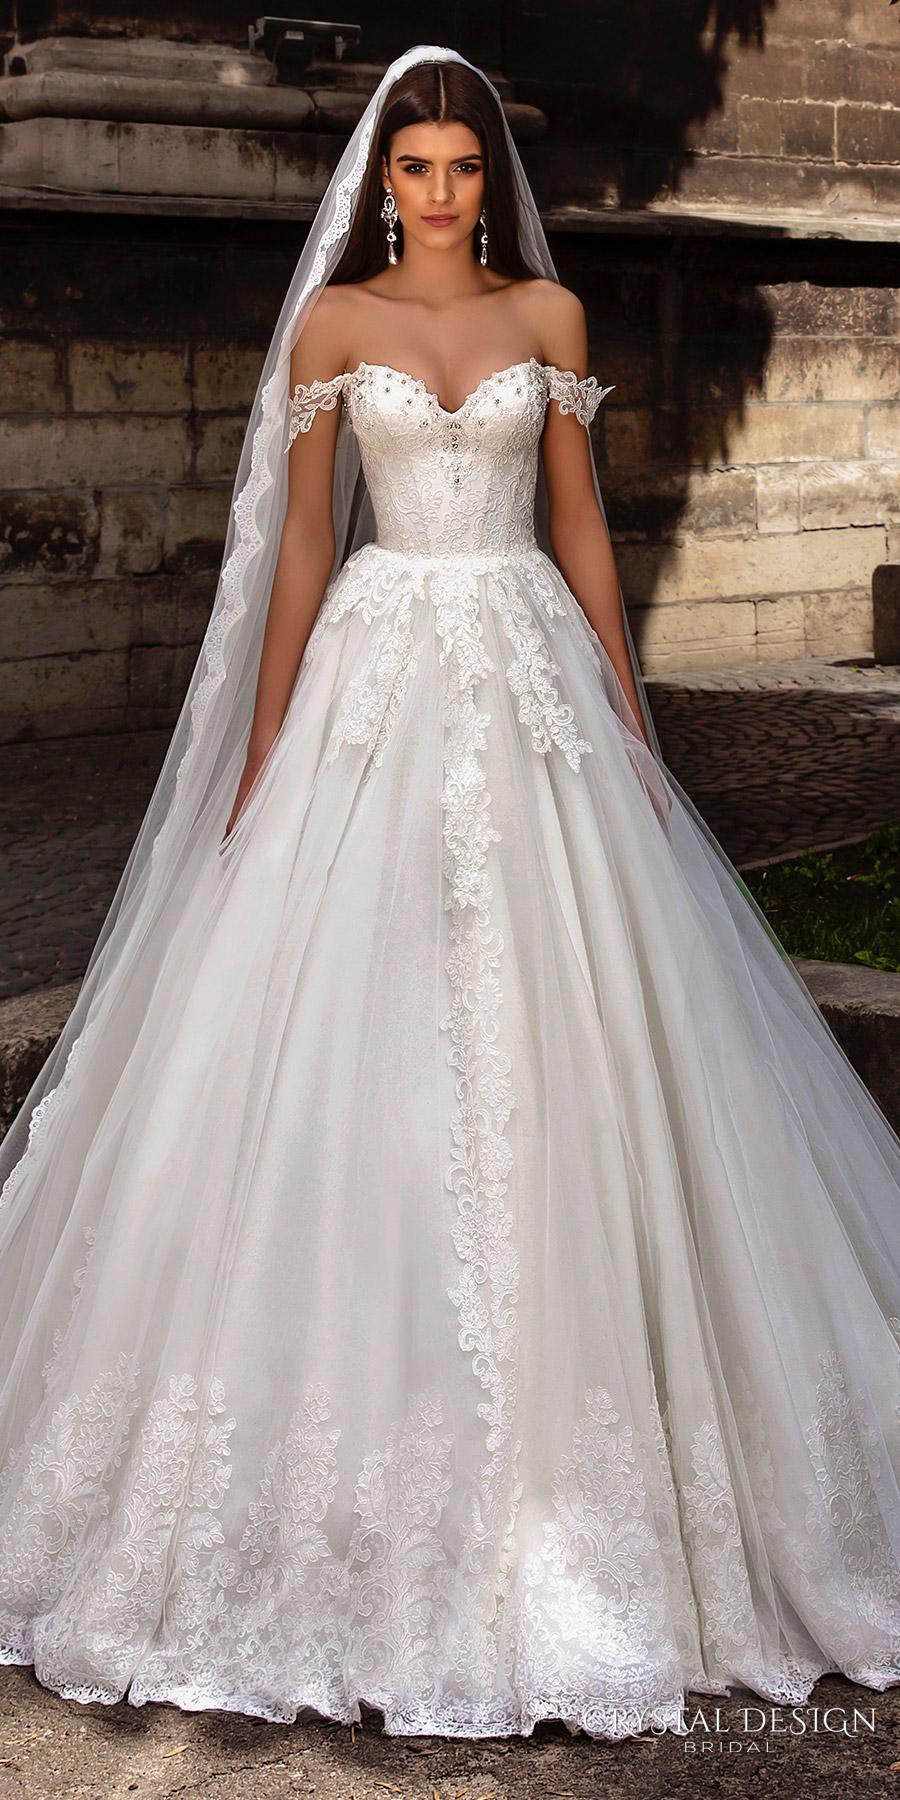 ball wedding dresses wedding ball gown dresses Ball wedding dresses